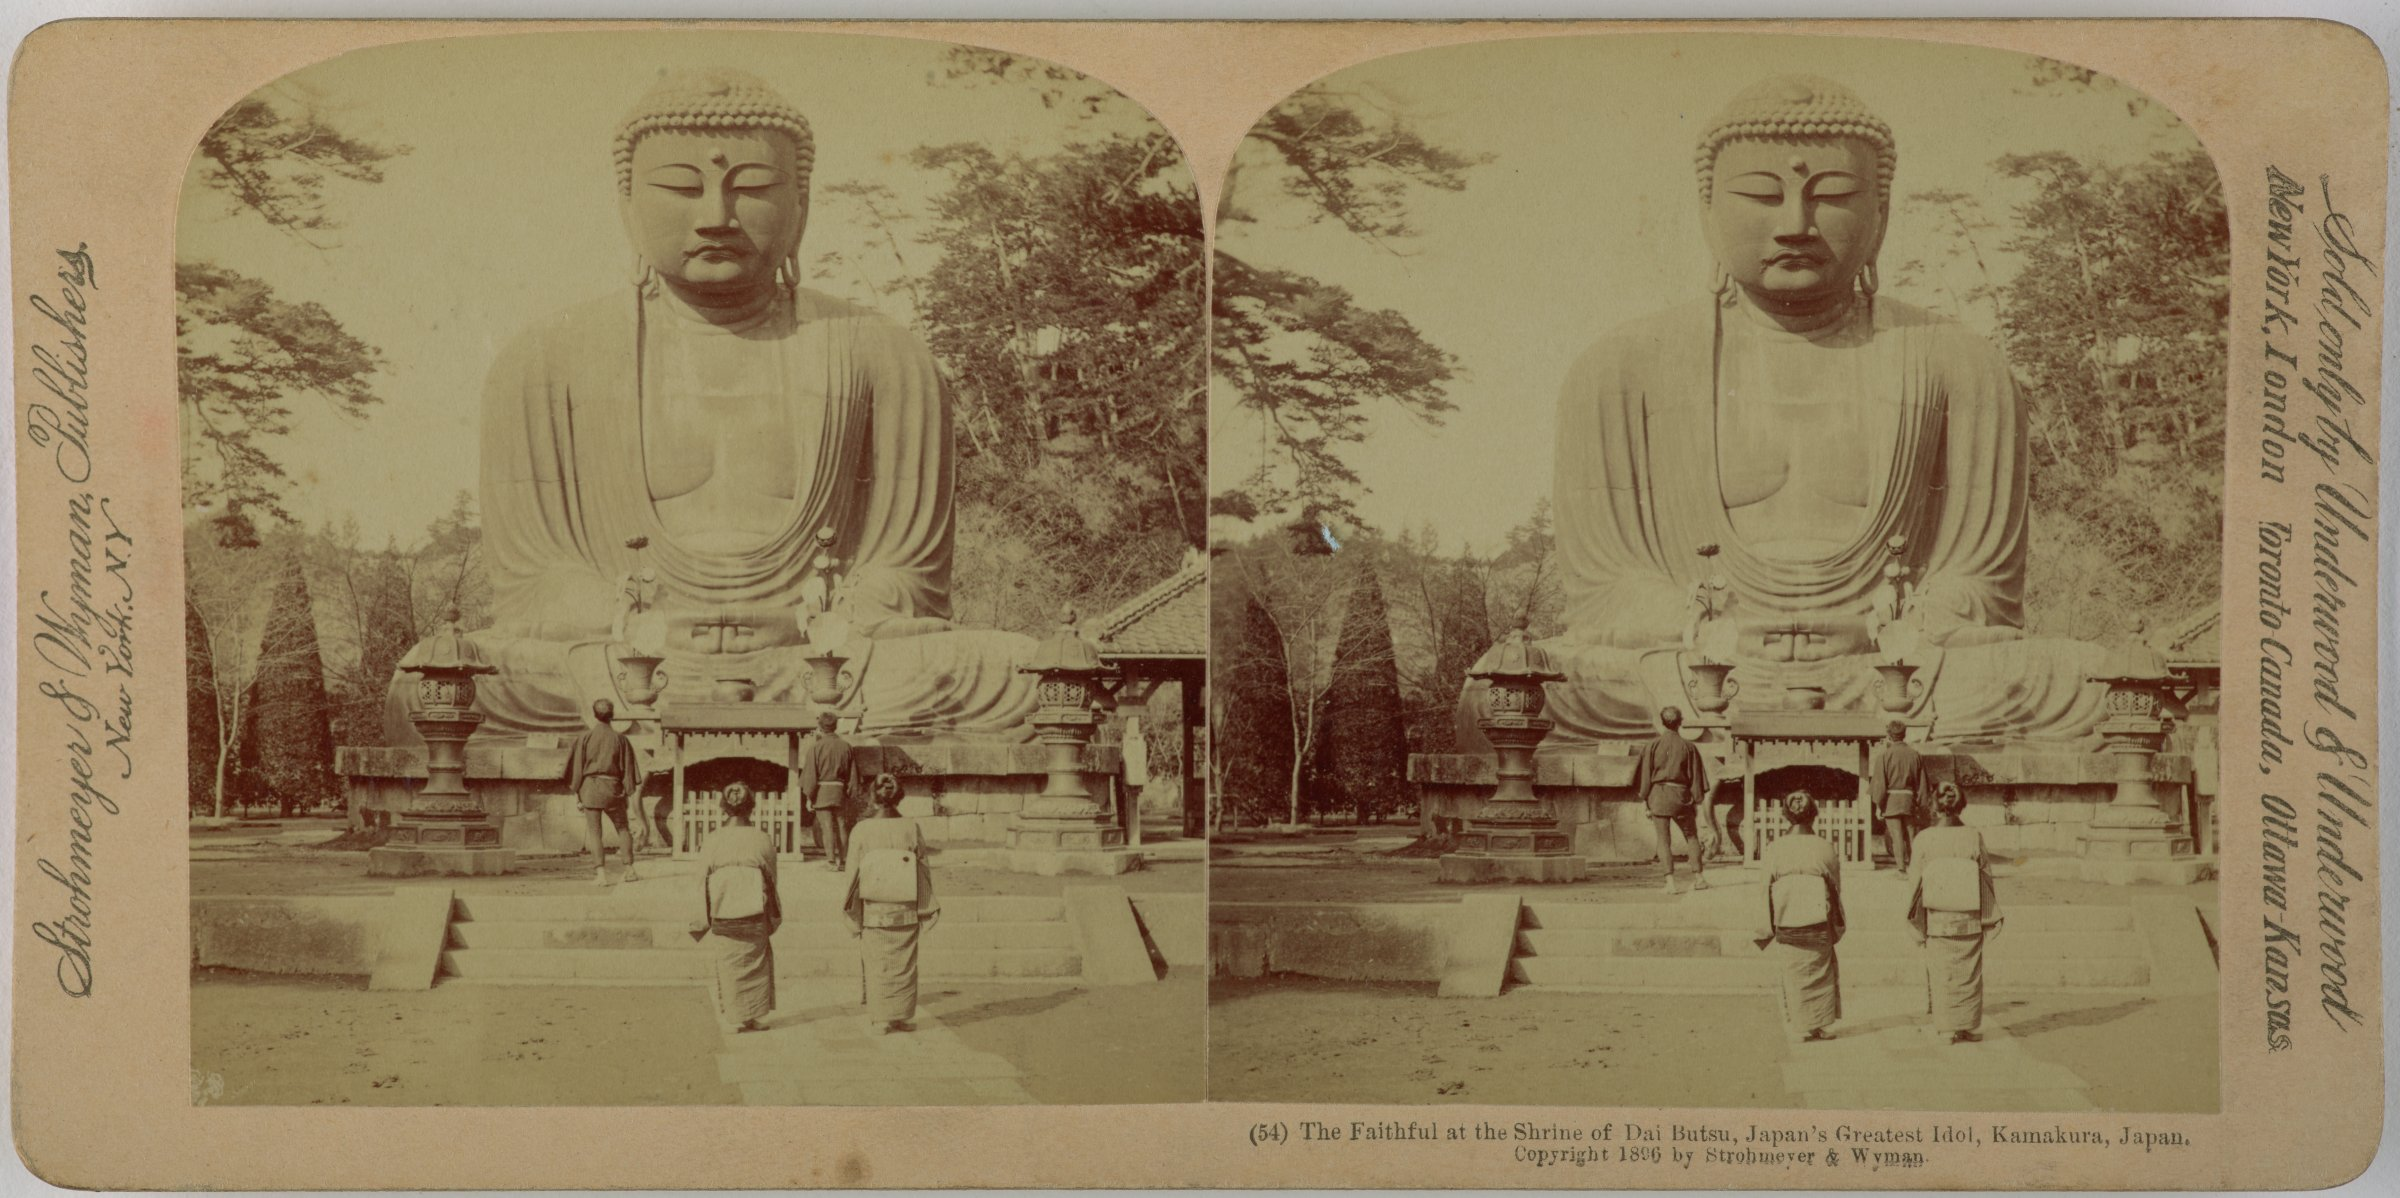 The Faithful at the Shrine of Dai Butsu, Japan's greatest Idol, Kamakura, Japan, Underwood & Underwood Publishers, gelatin silver prints mounted on card